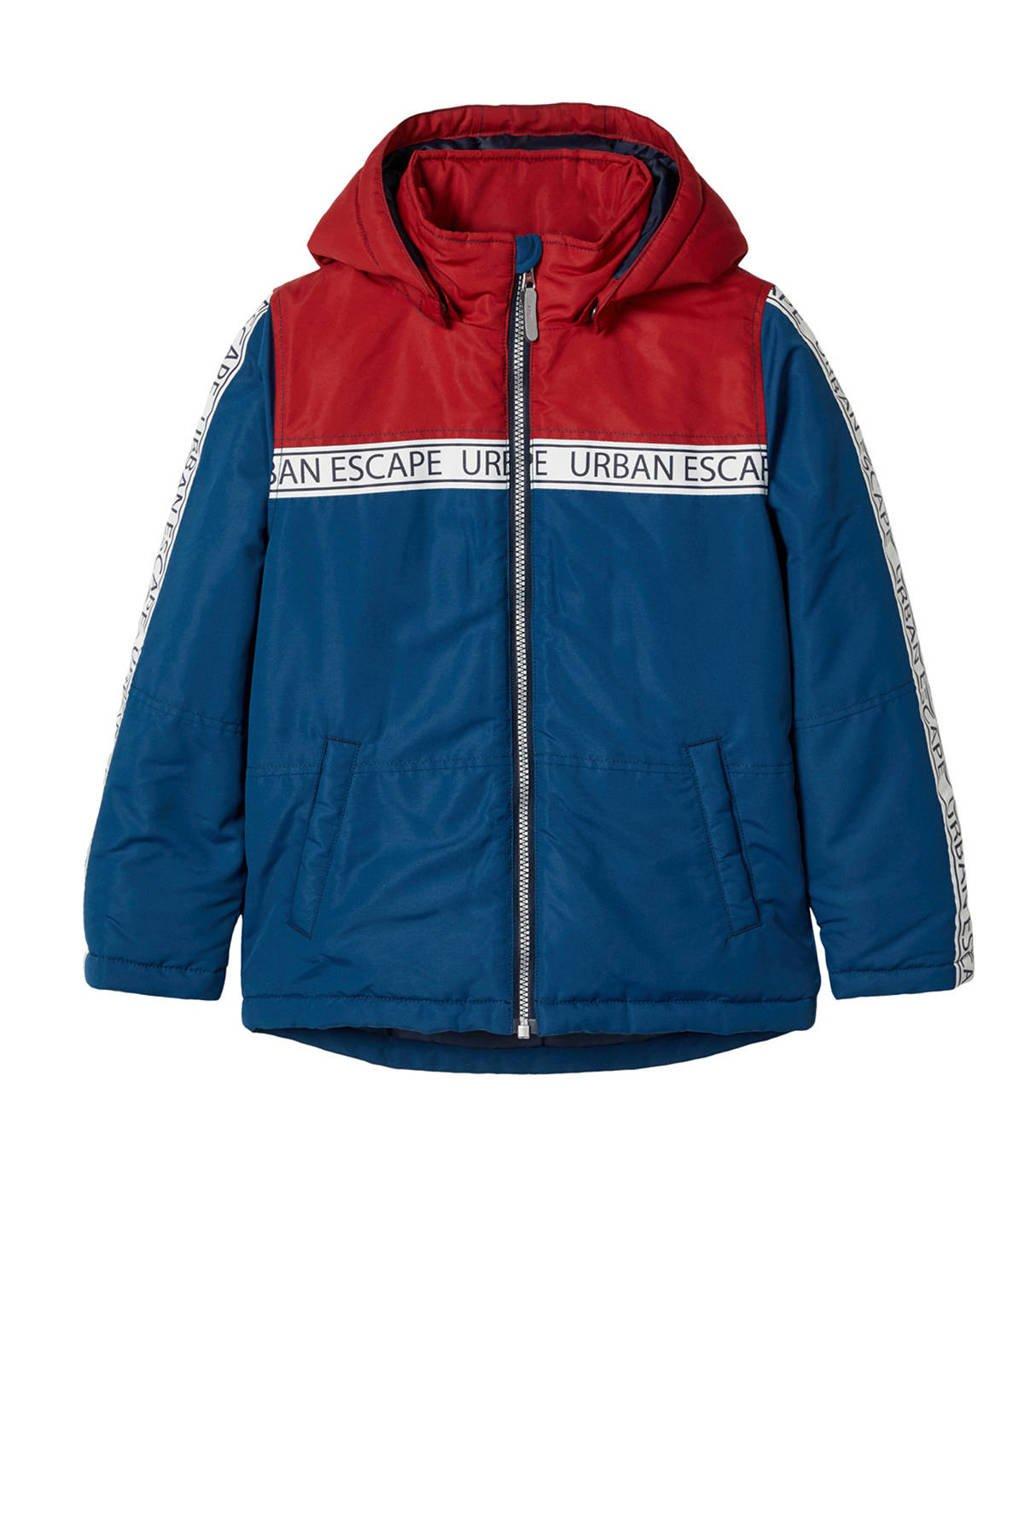 NAME IT KIDS gewatteerde winterjas Maxi blauw/rood, Blauw/rood